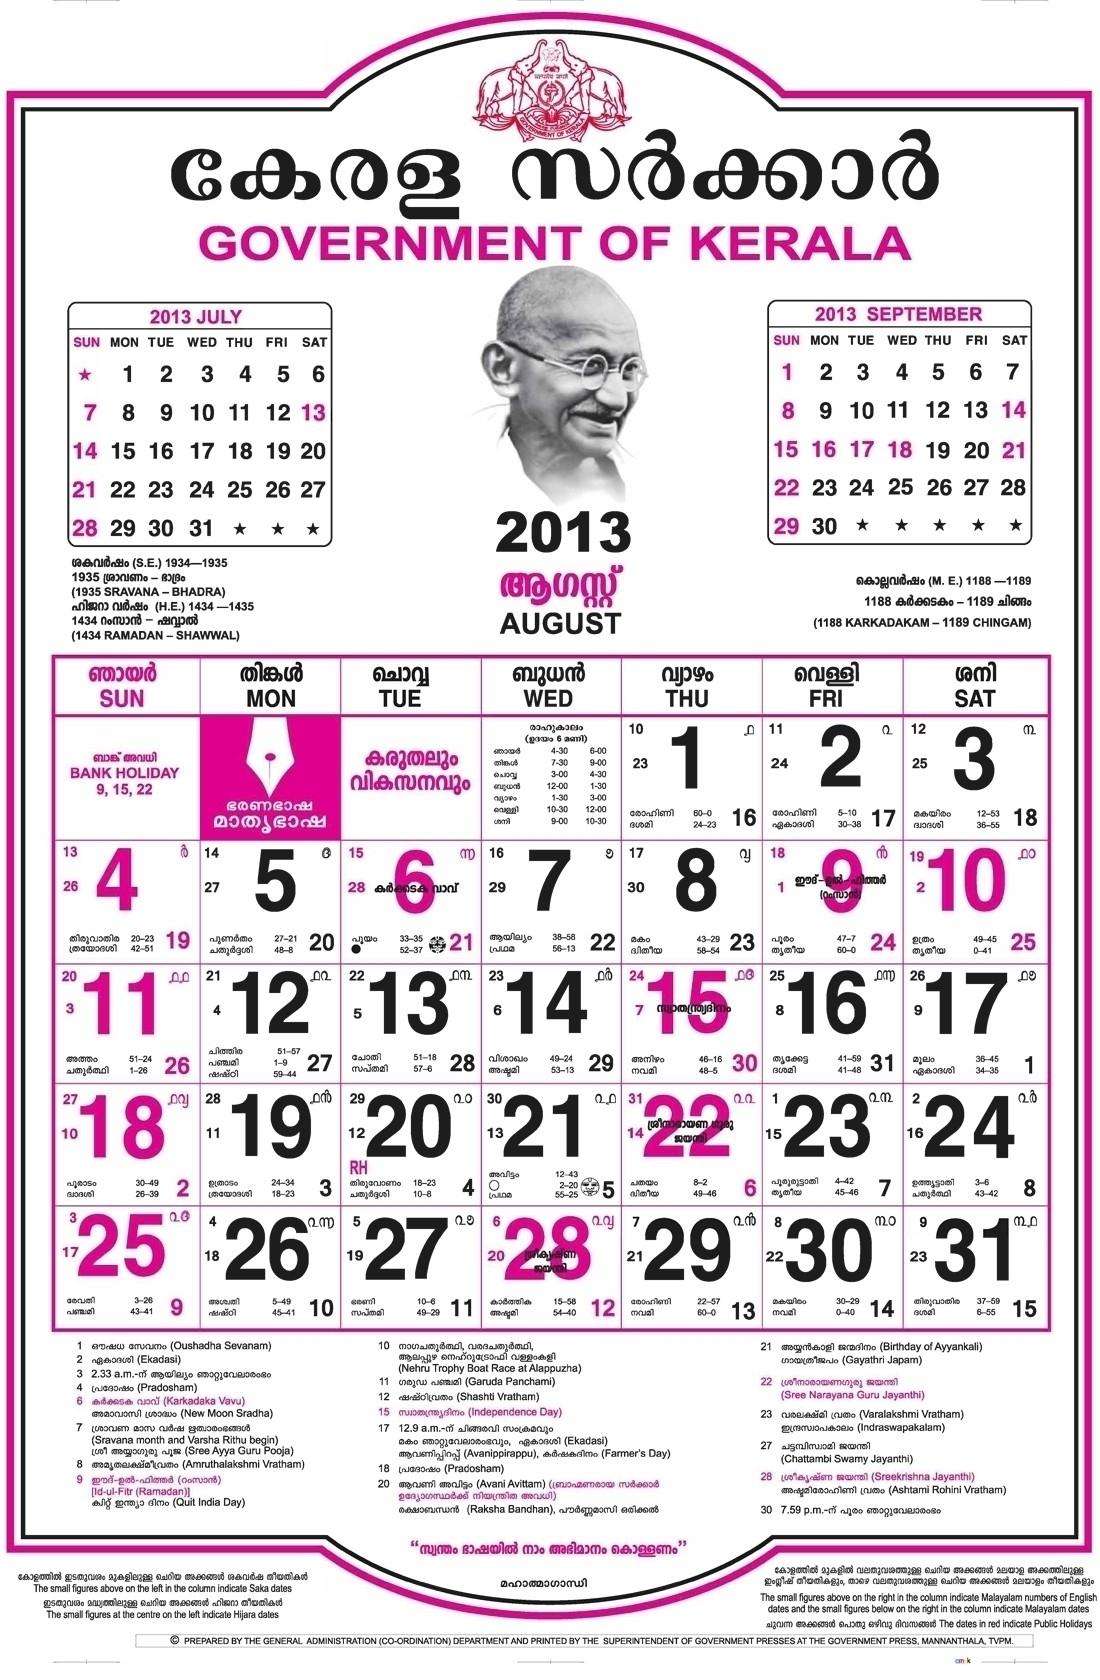 Calendar 2001 Malayalam August Image - Calendar Inspiration Design  Calendar 2001 Malayalam August Image